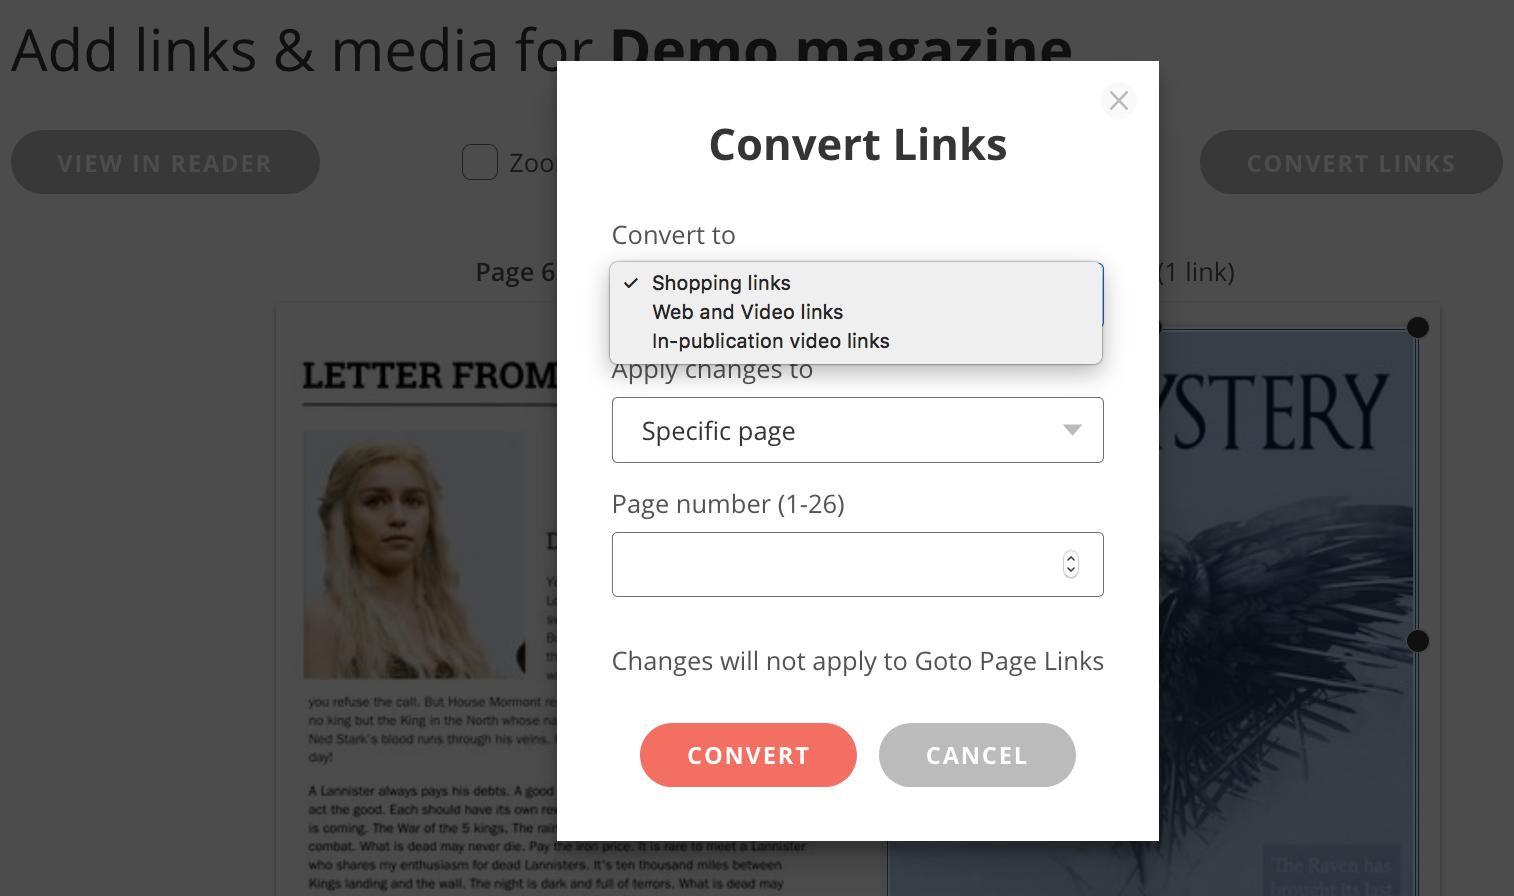 Issuu convert links